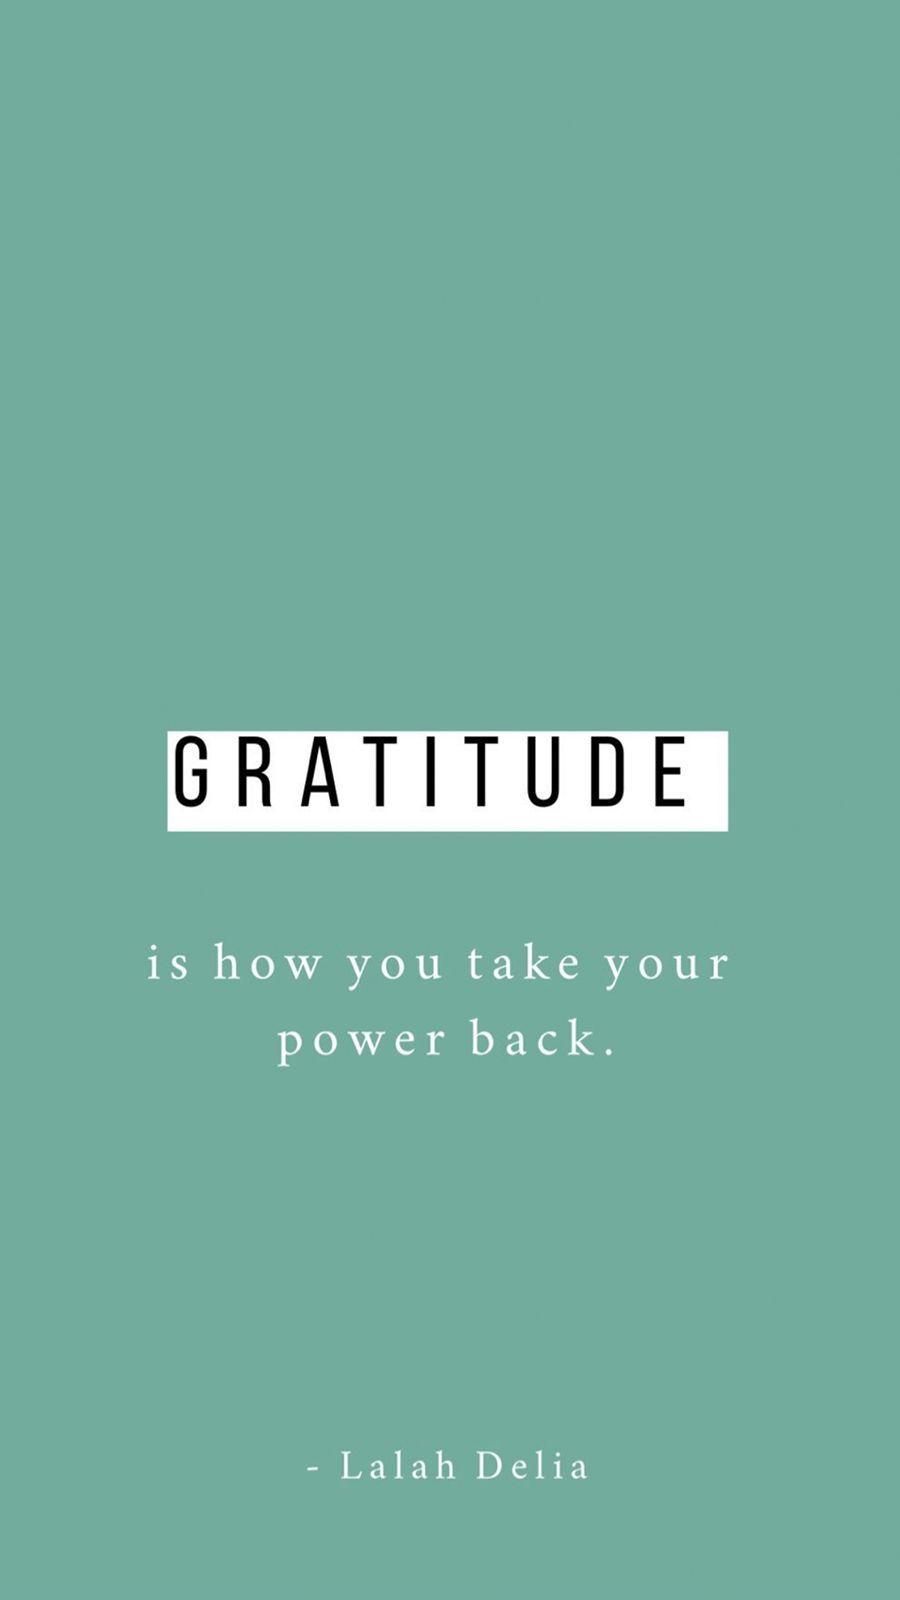 Gratitude Wallpaper Screensaver For Phone Free Gratitude Phone Wallpaper Gratitude Quote Wallpaper F In 2020 Gratitude Quotes Inspirational Quotes Wallpaper Quotes